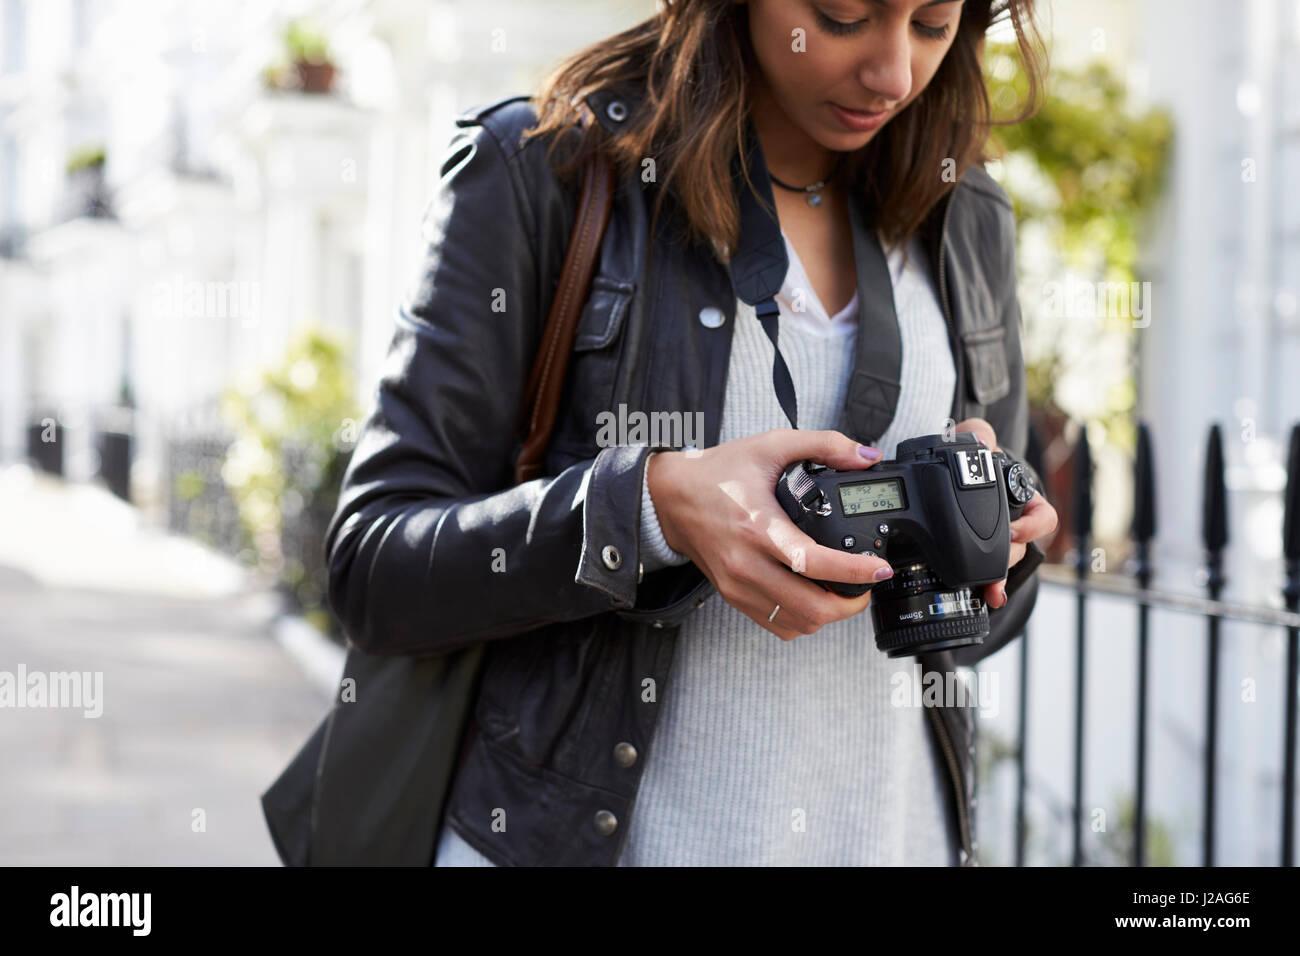 Woman looking at the screen of a digital camera, close up - Stock Image